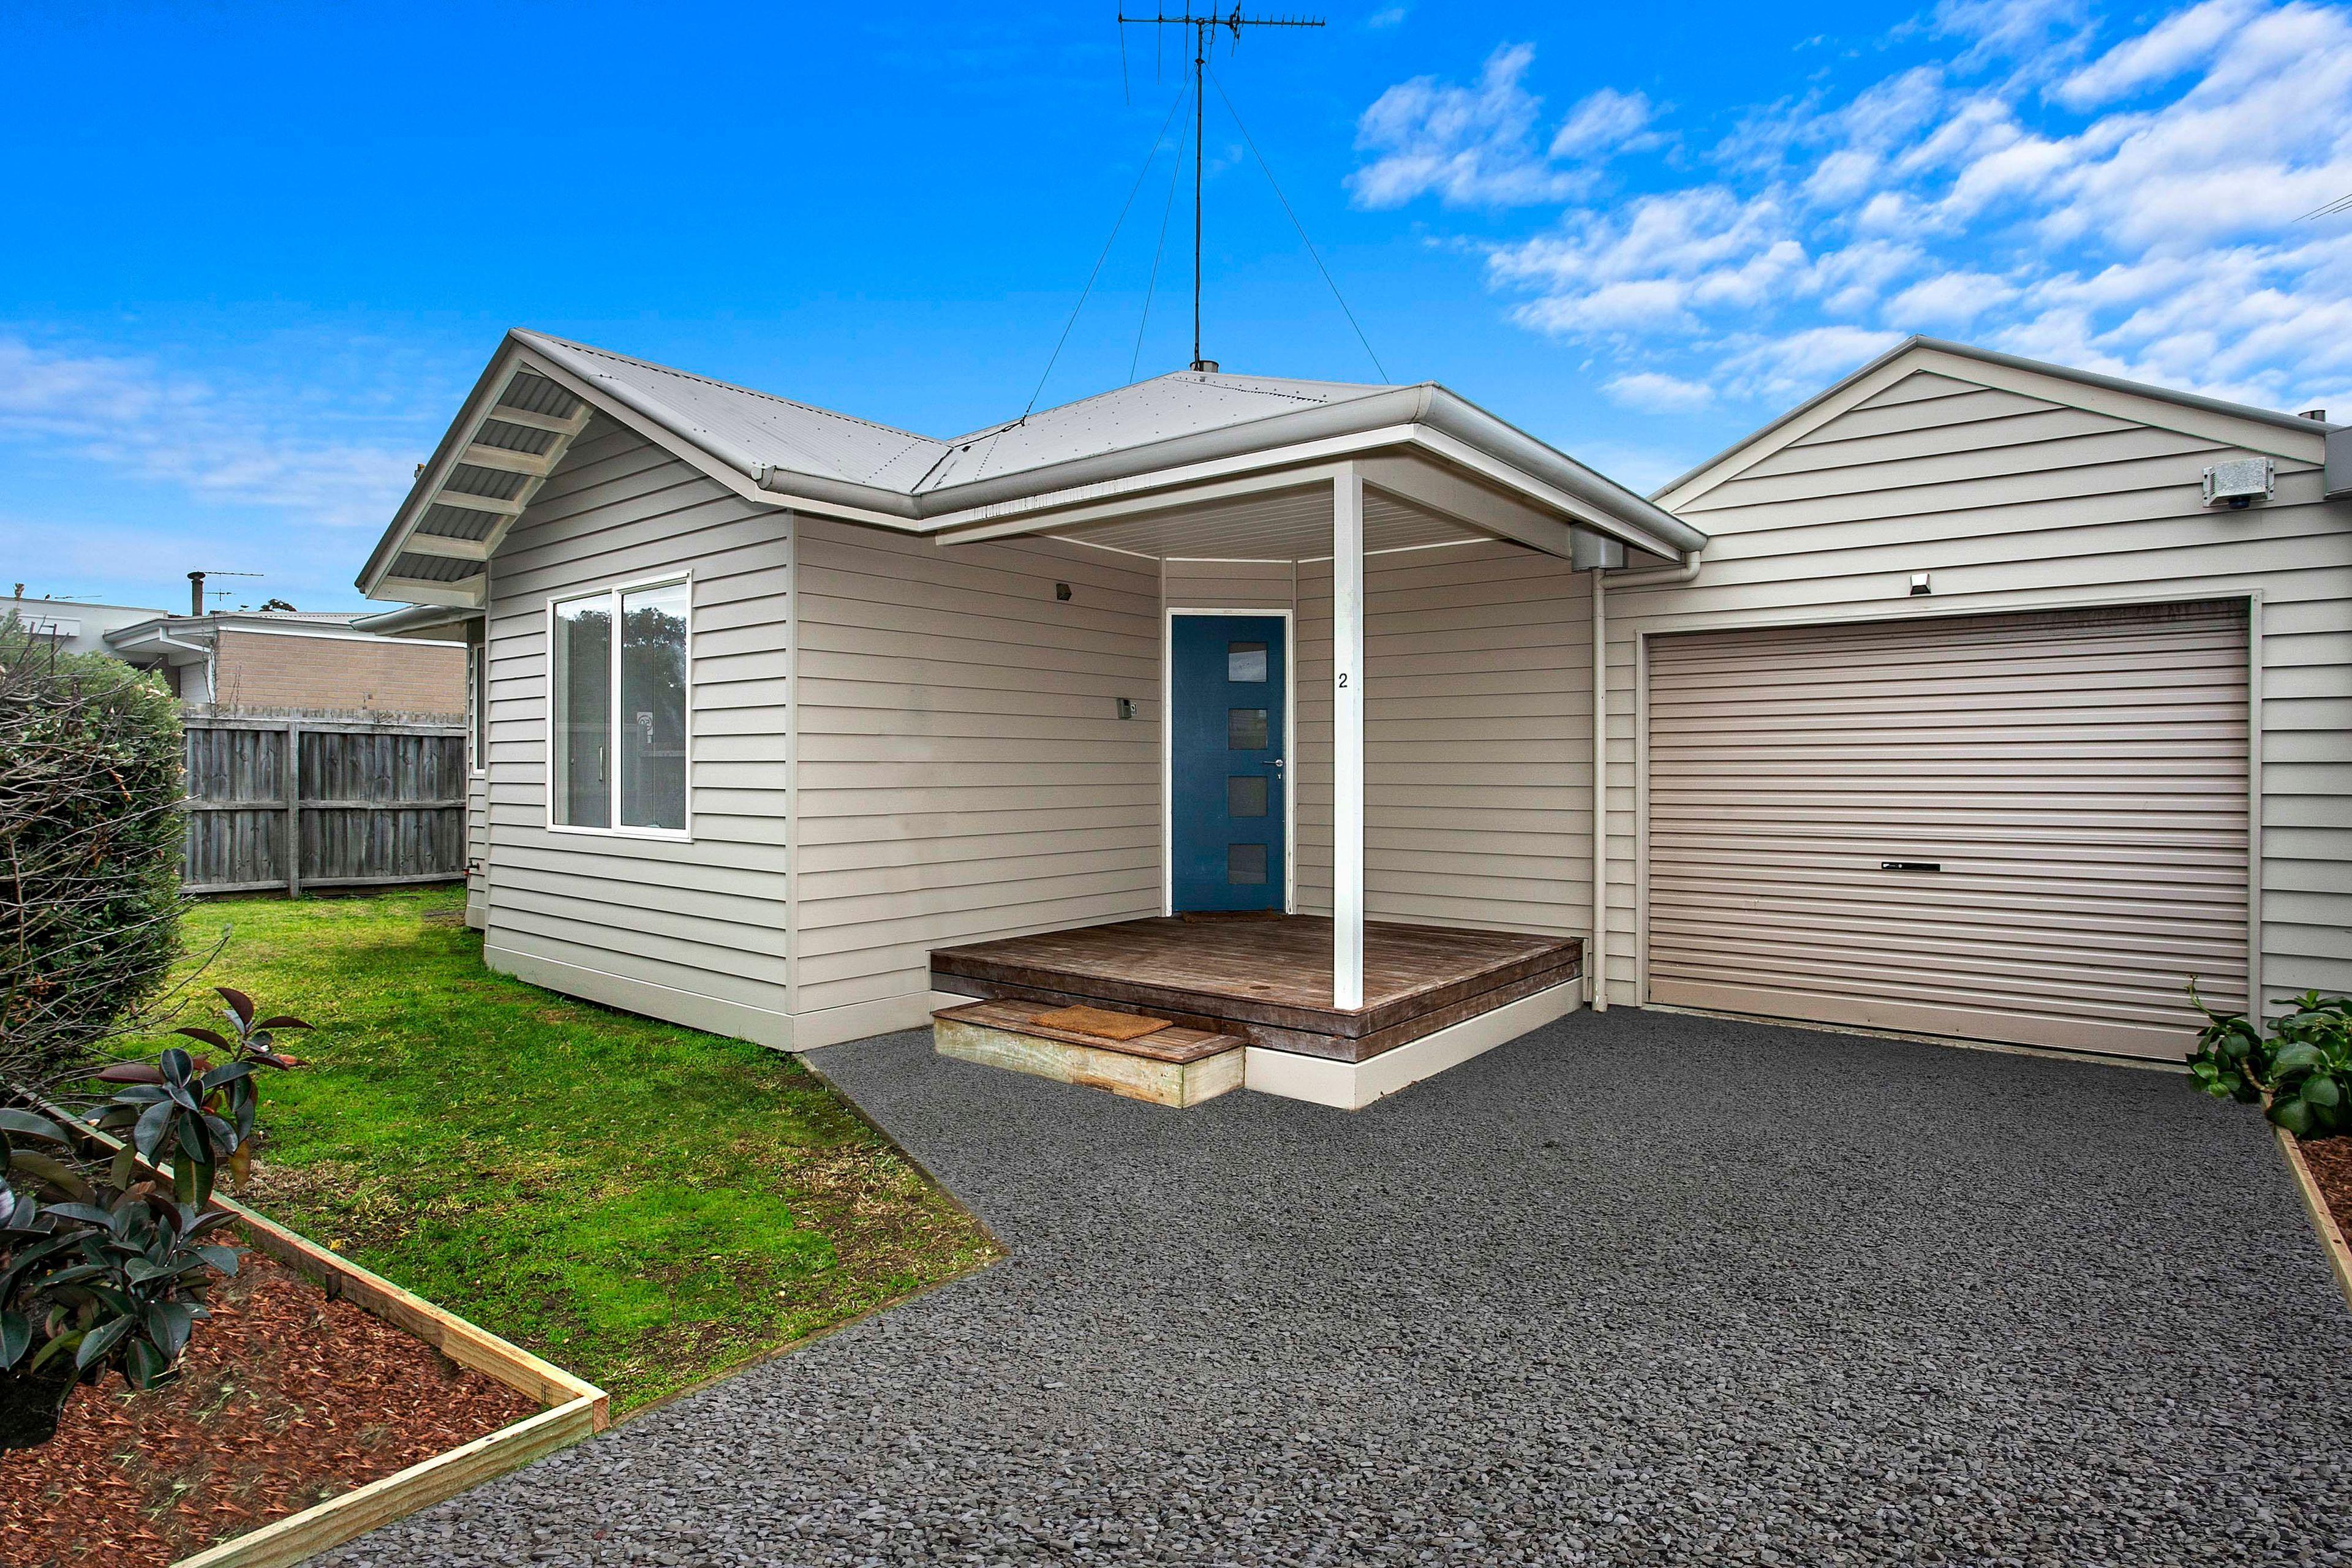 2 Geelong Road, Barwon Heads VIC 3227